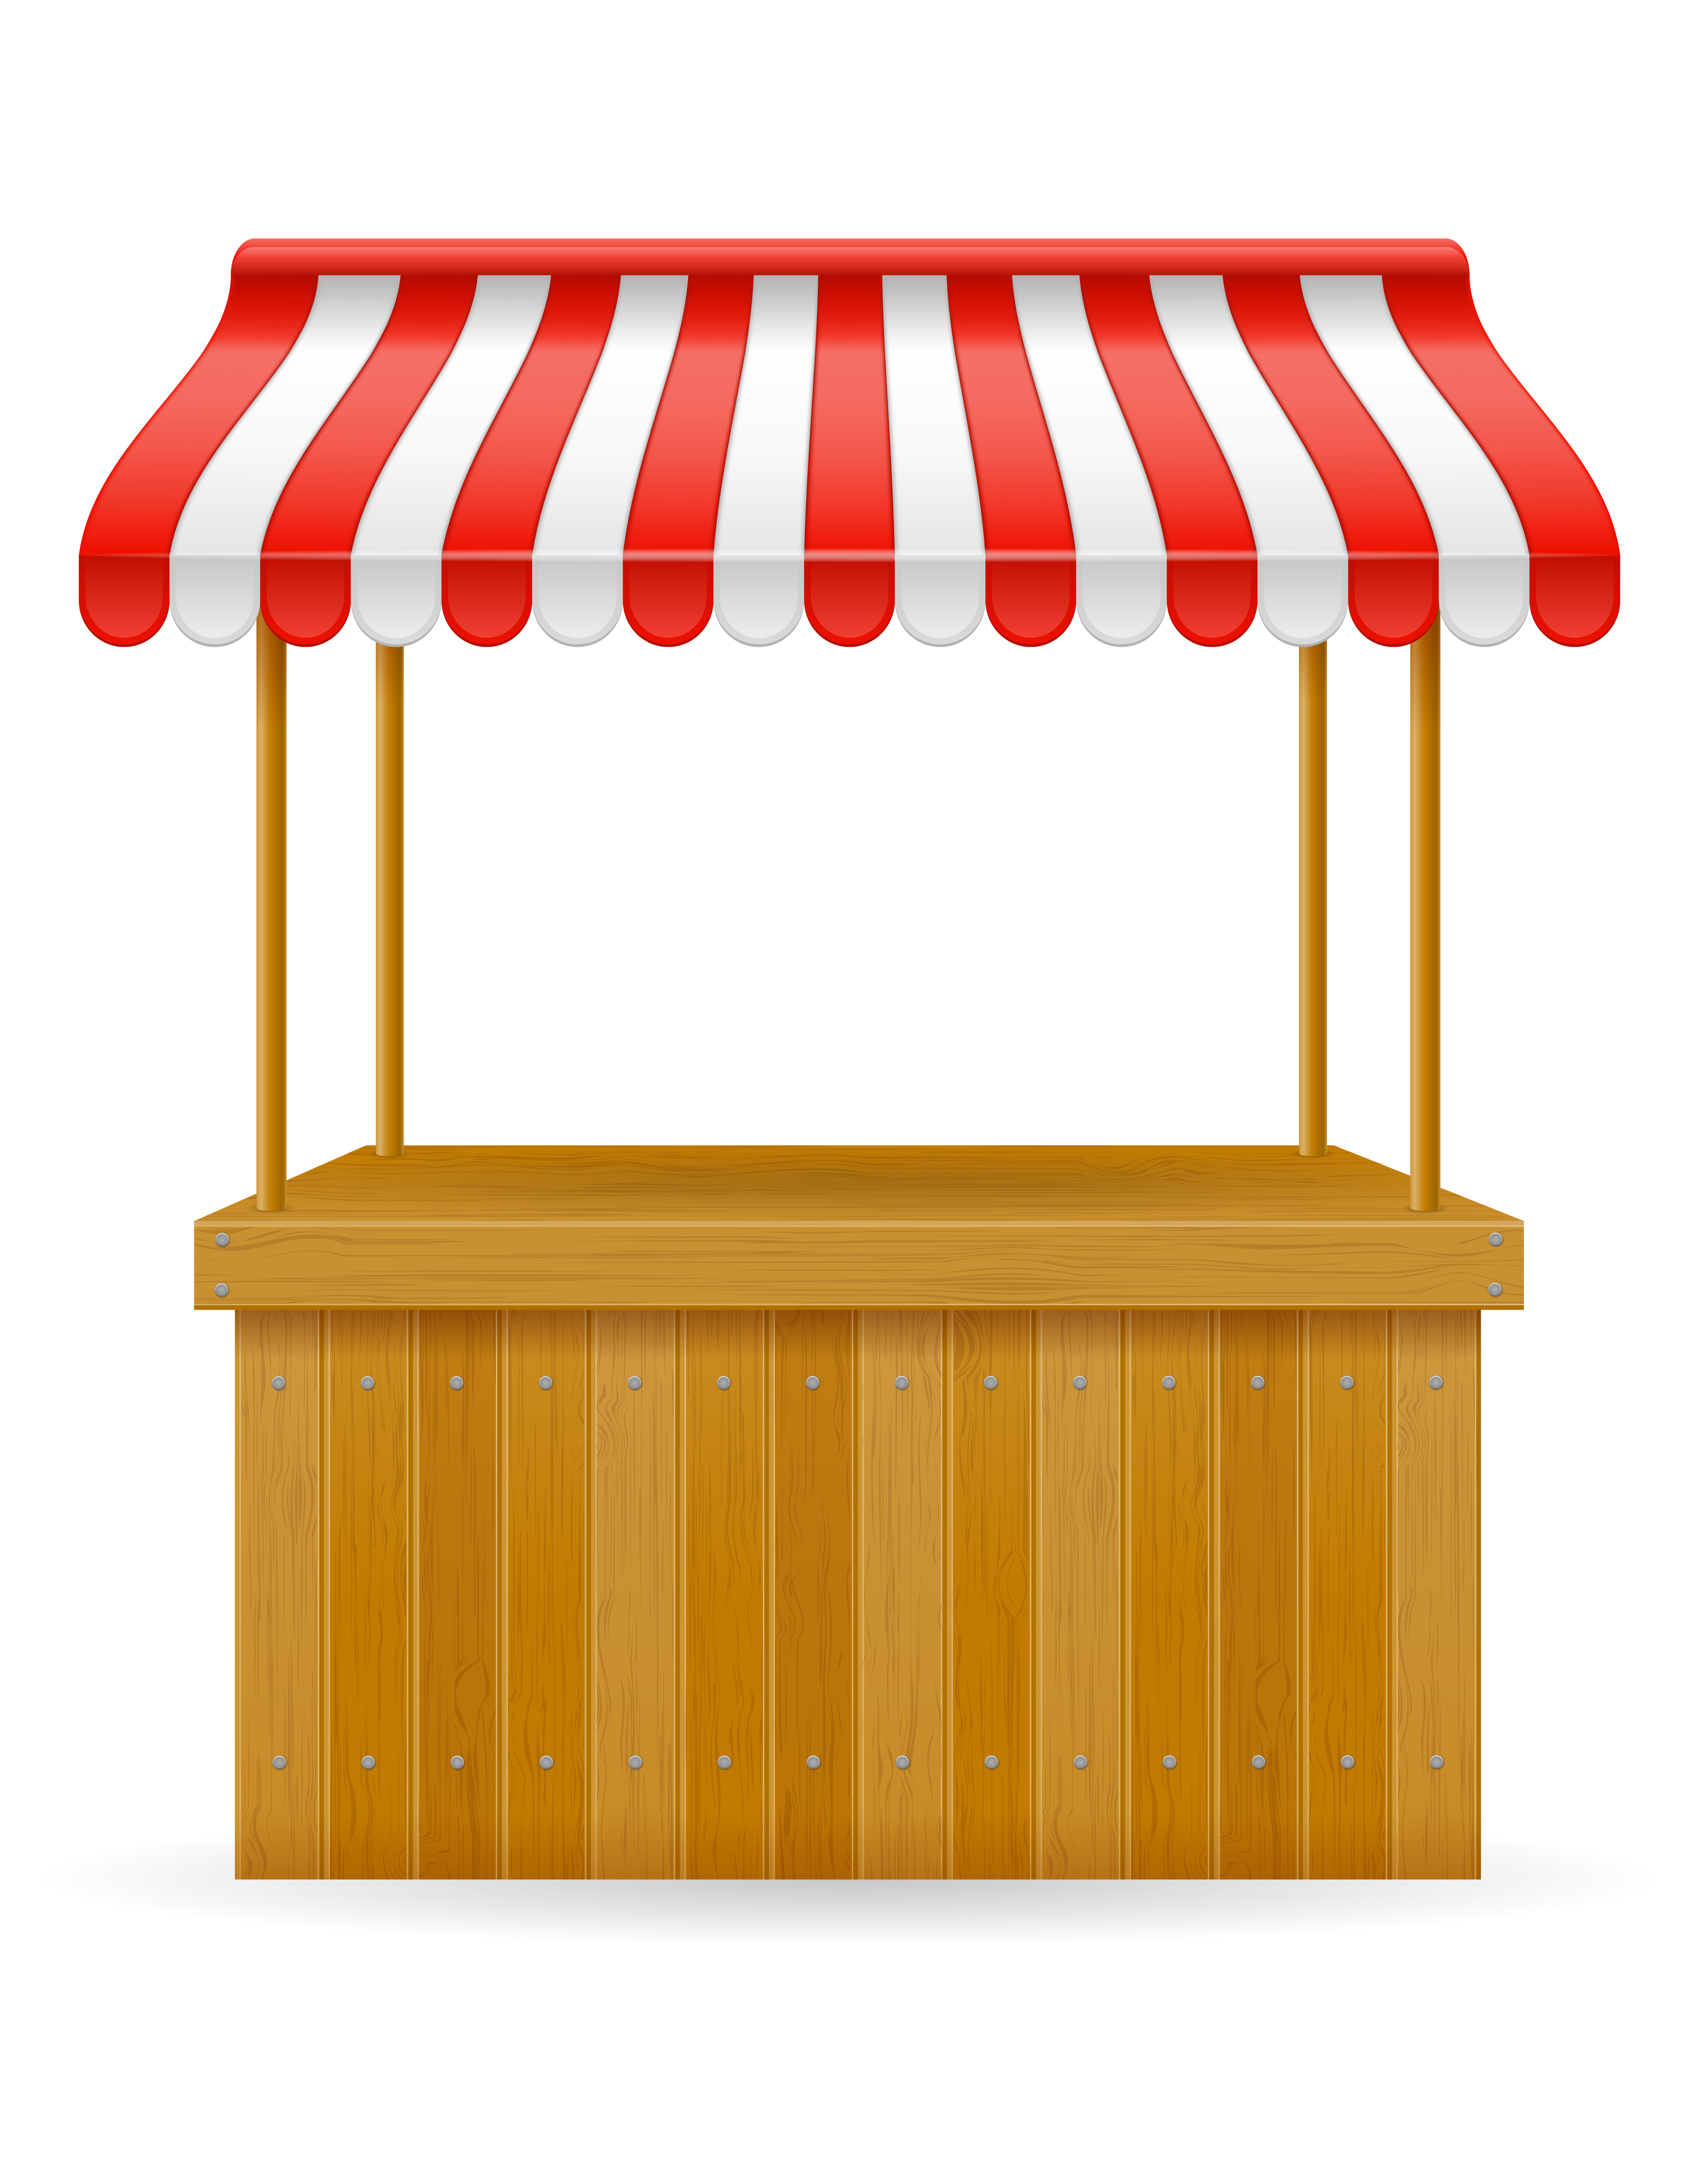 street food stall vector illustration - Download Free ...